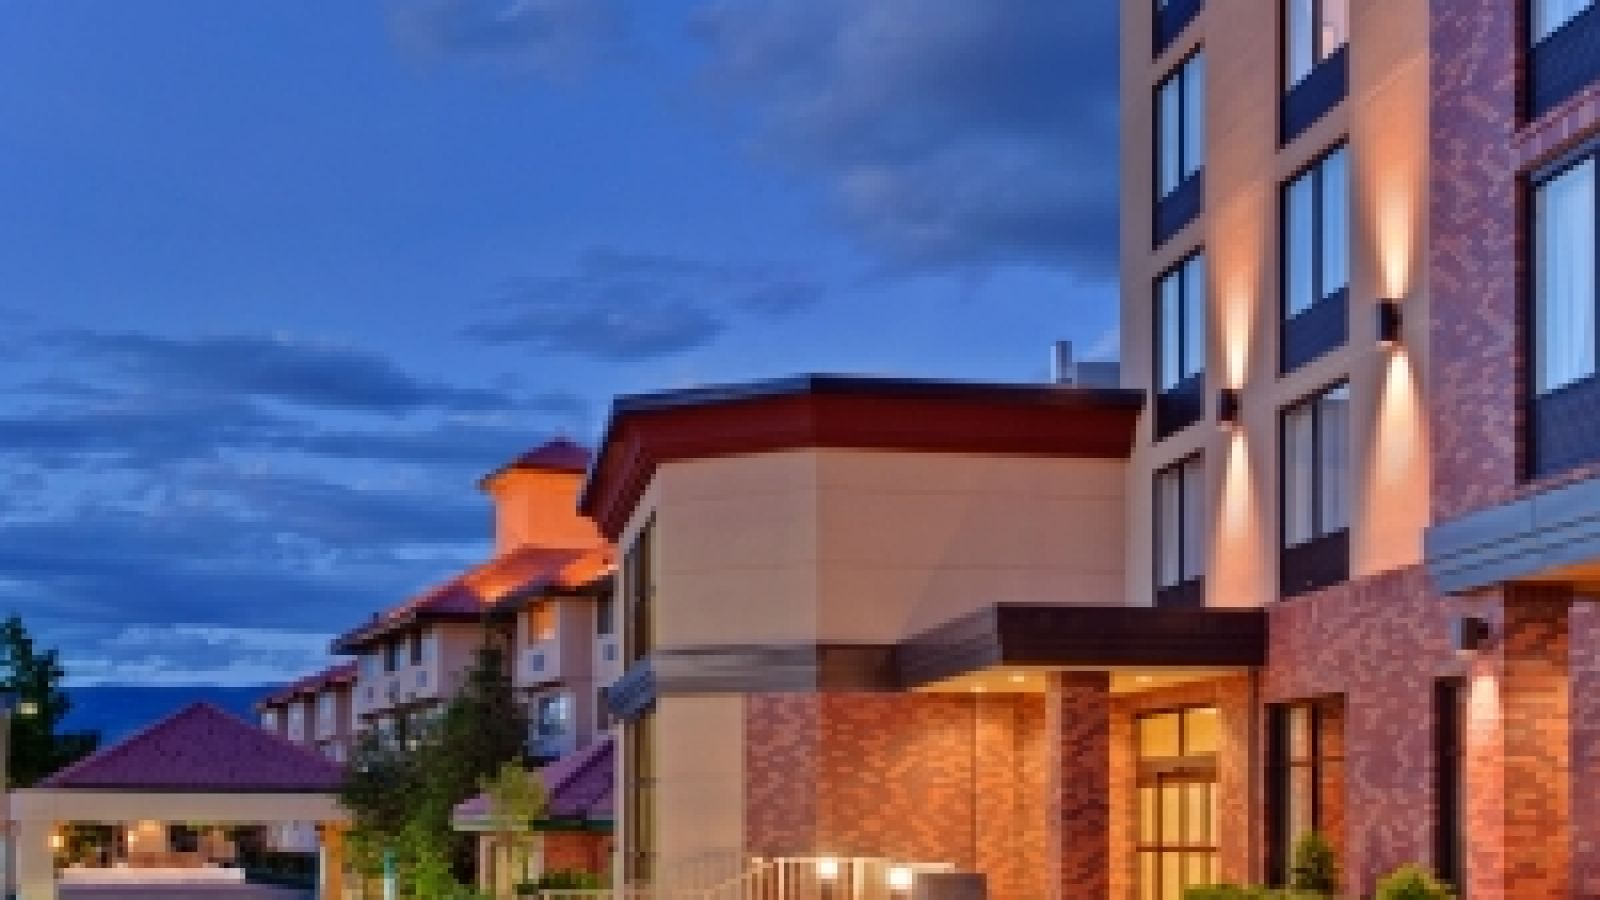 Kanata Kelowna Hotel & Conference Centre - exterior image